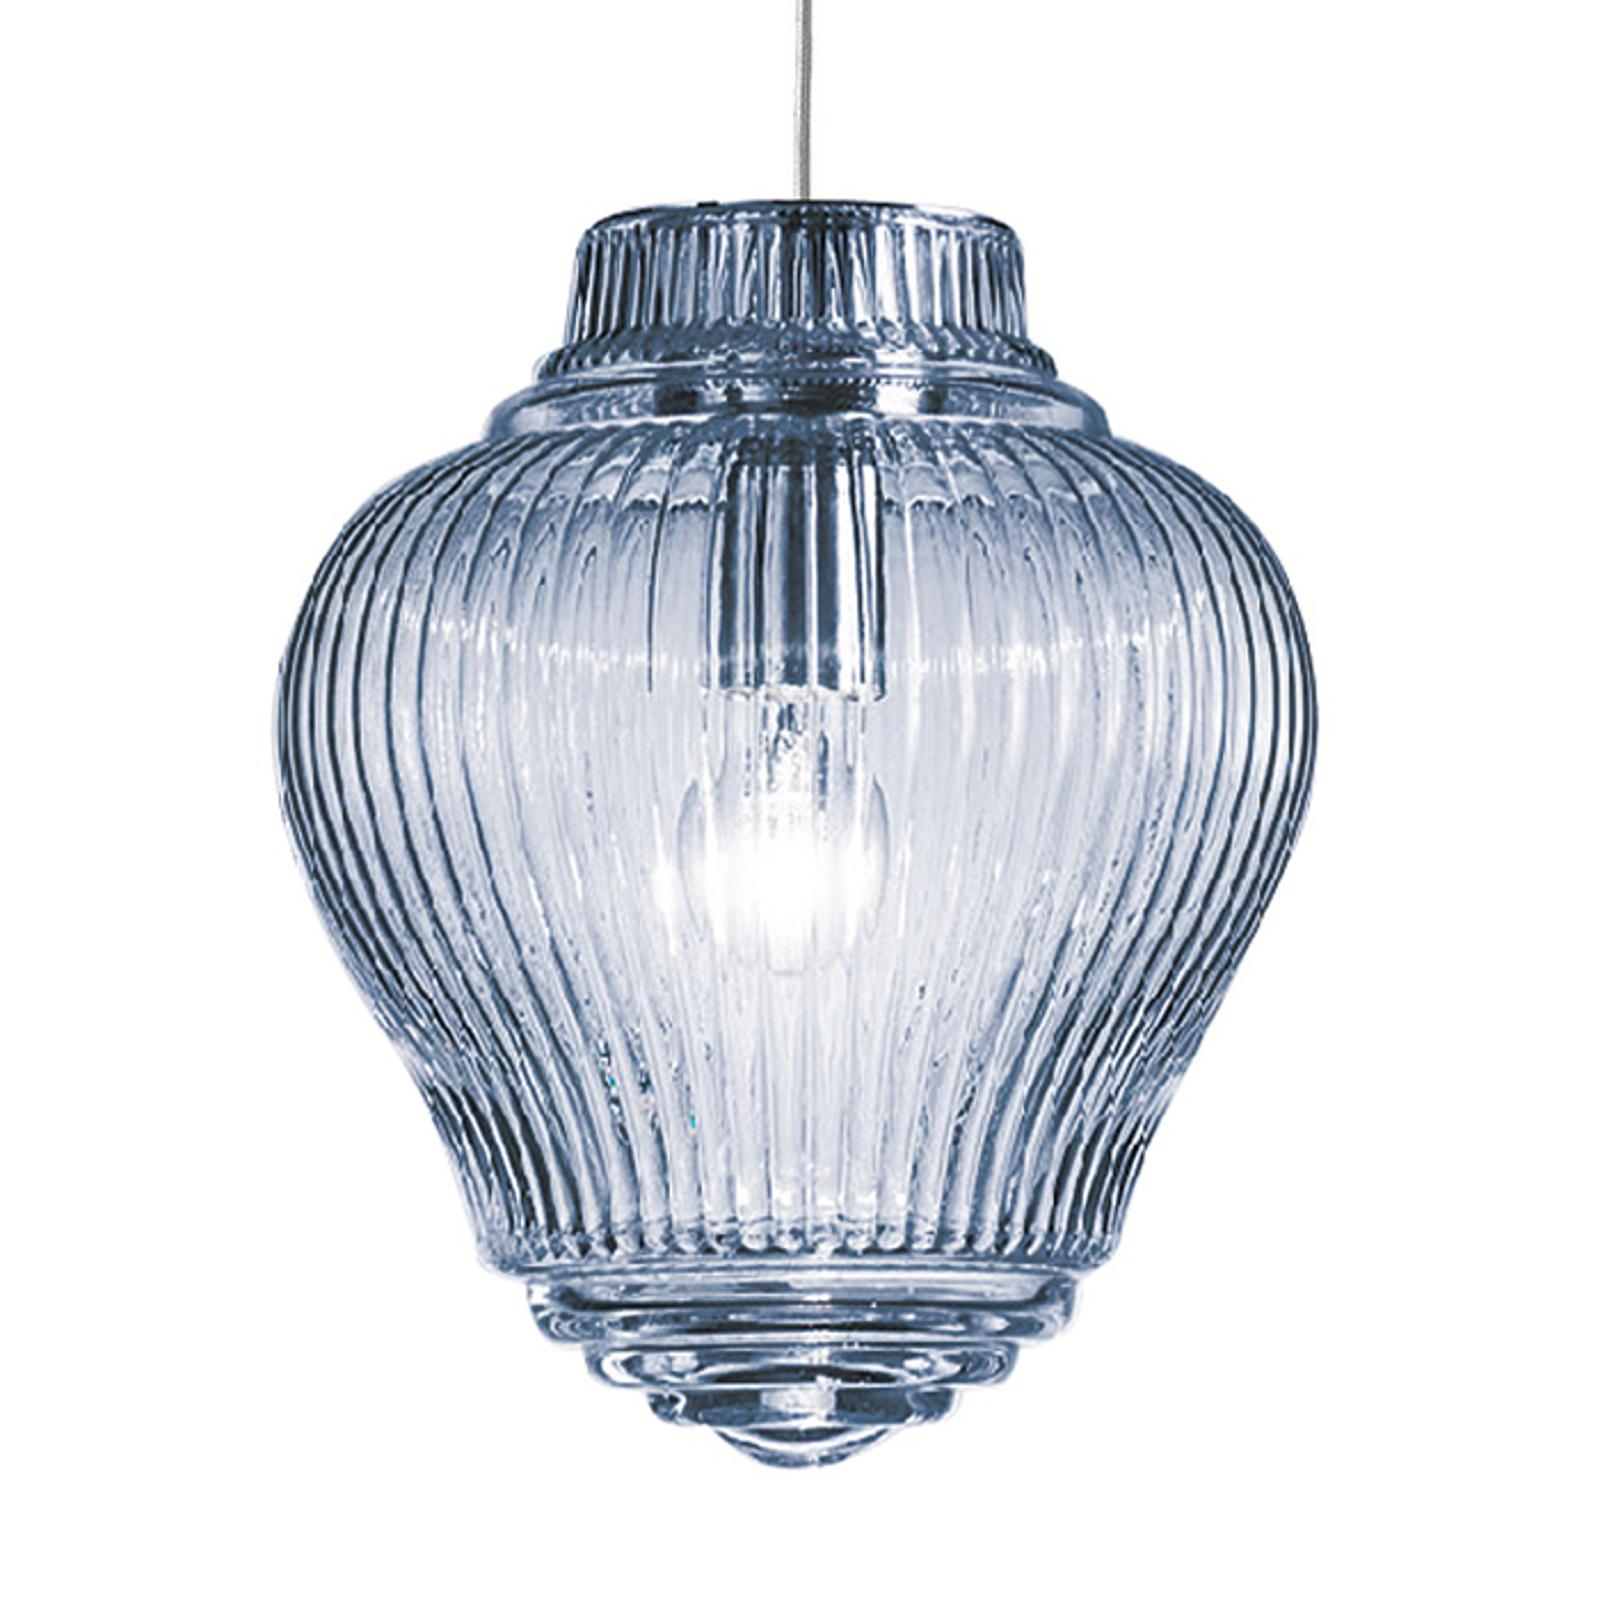 Clyde pendellampe 130 cm lyseblå